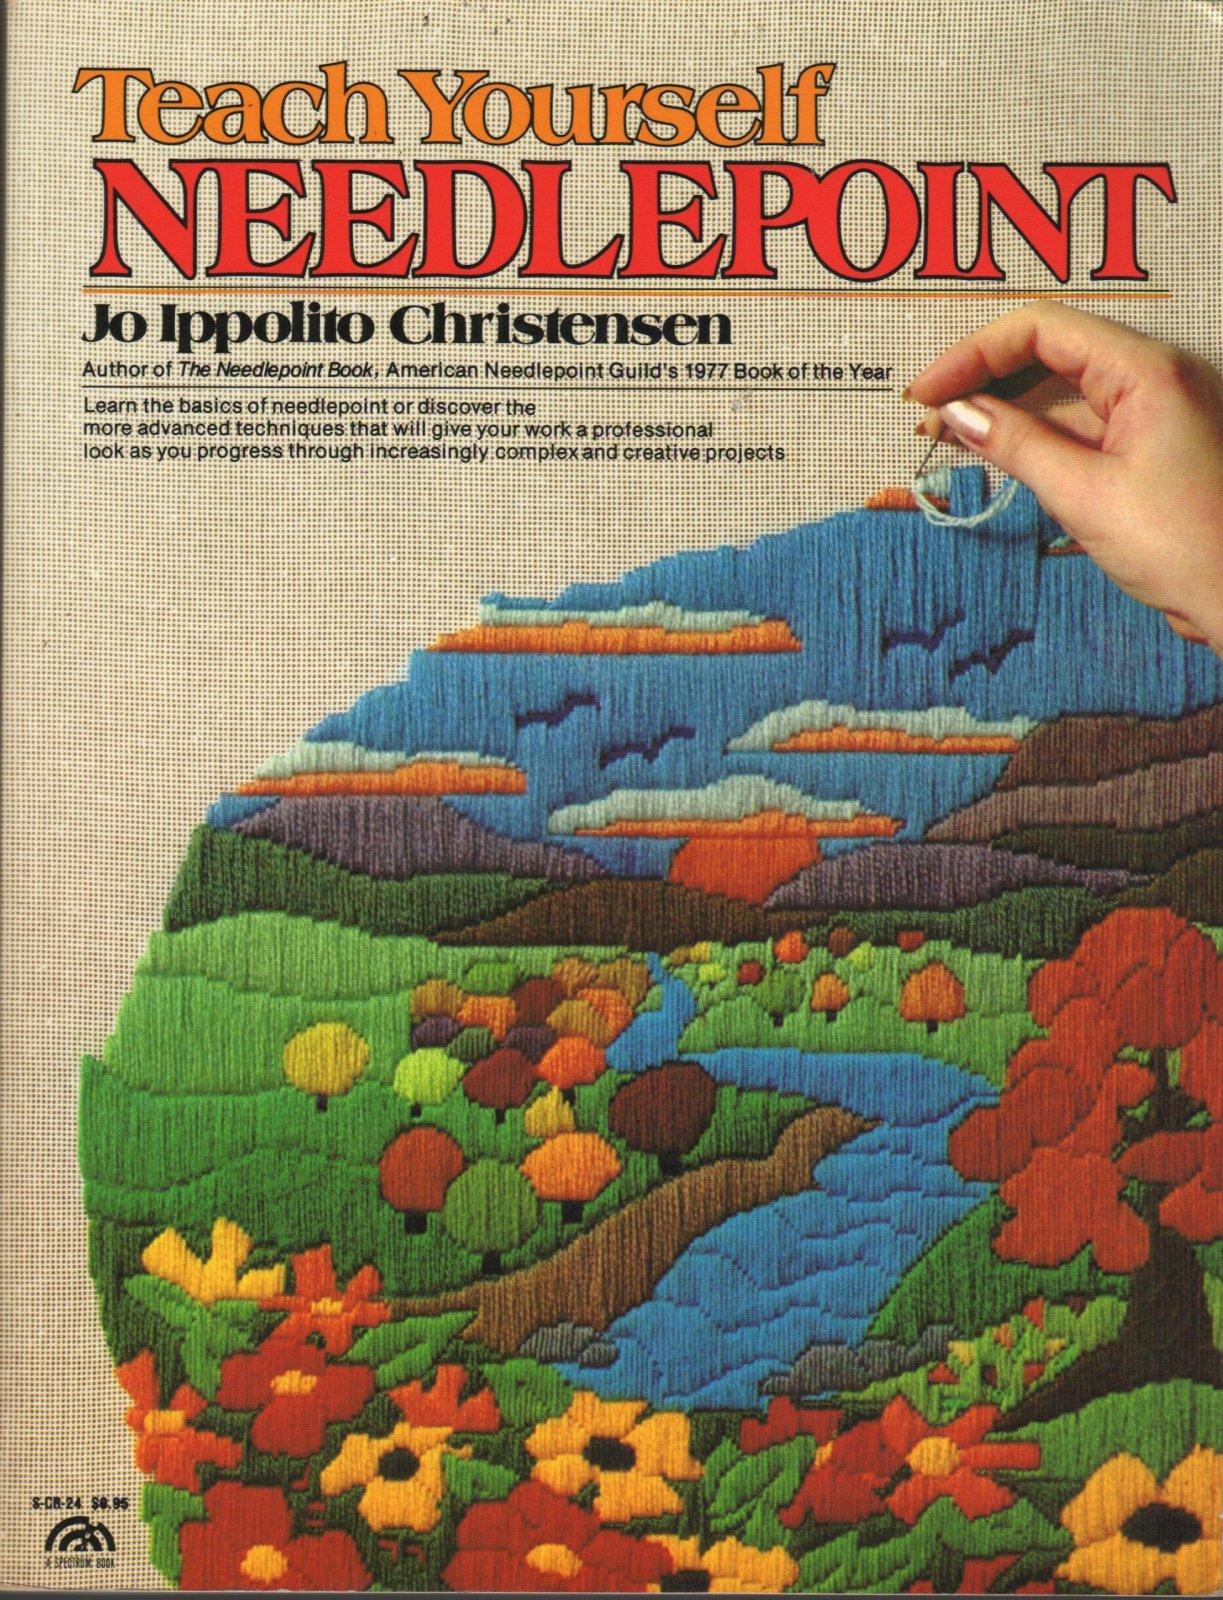 Teach Yourself Needlepoint by Jo Ippolito Christensen